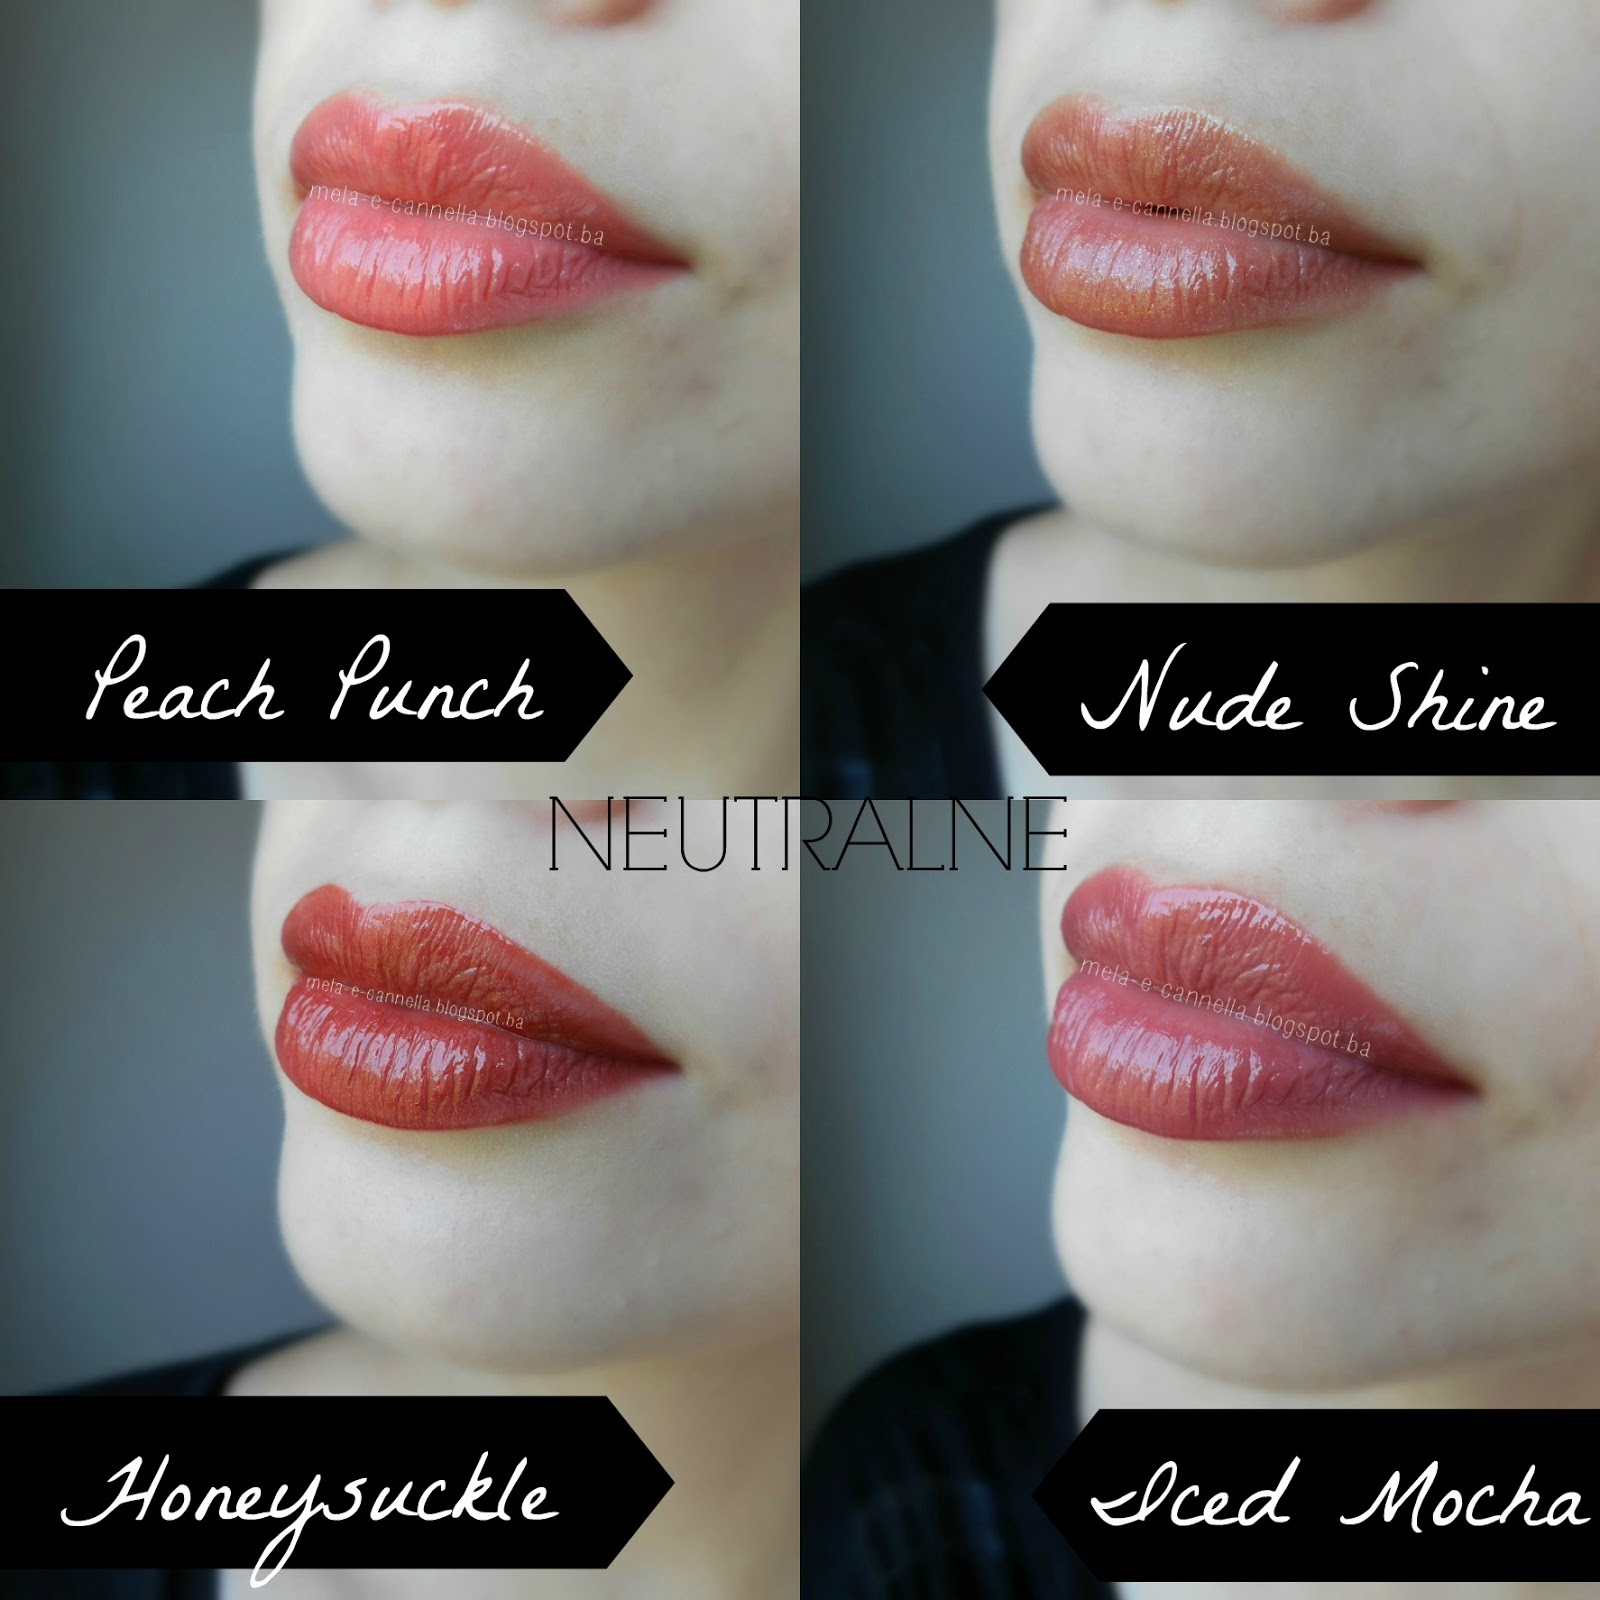 Mela E Cannella Avon Shine Burst Lipstick Iced Mocha